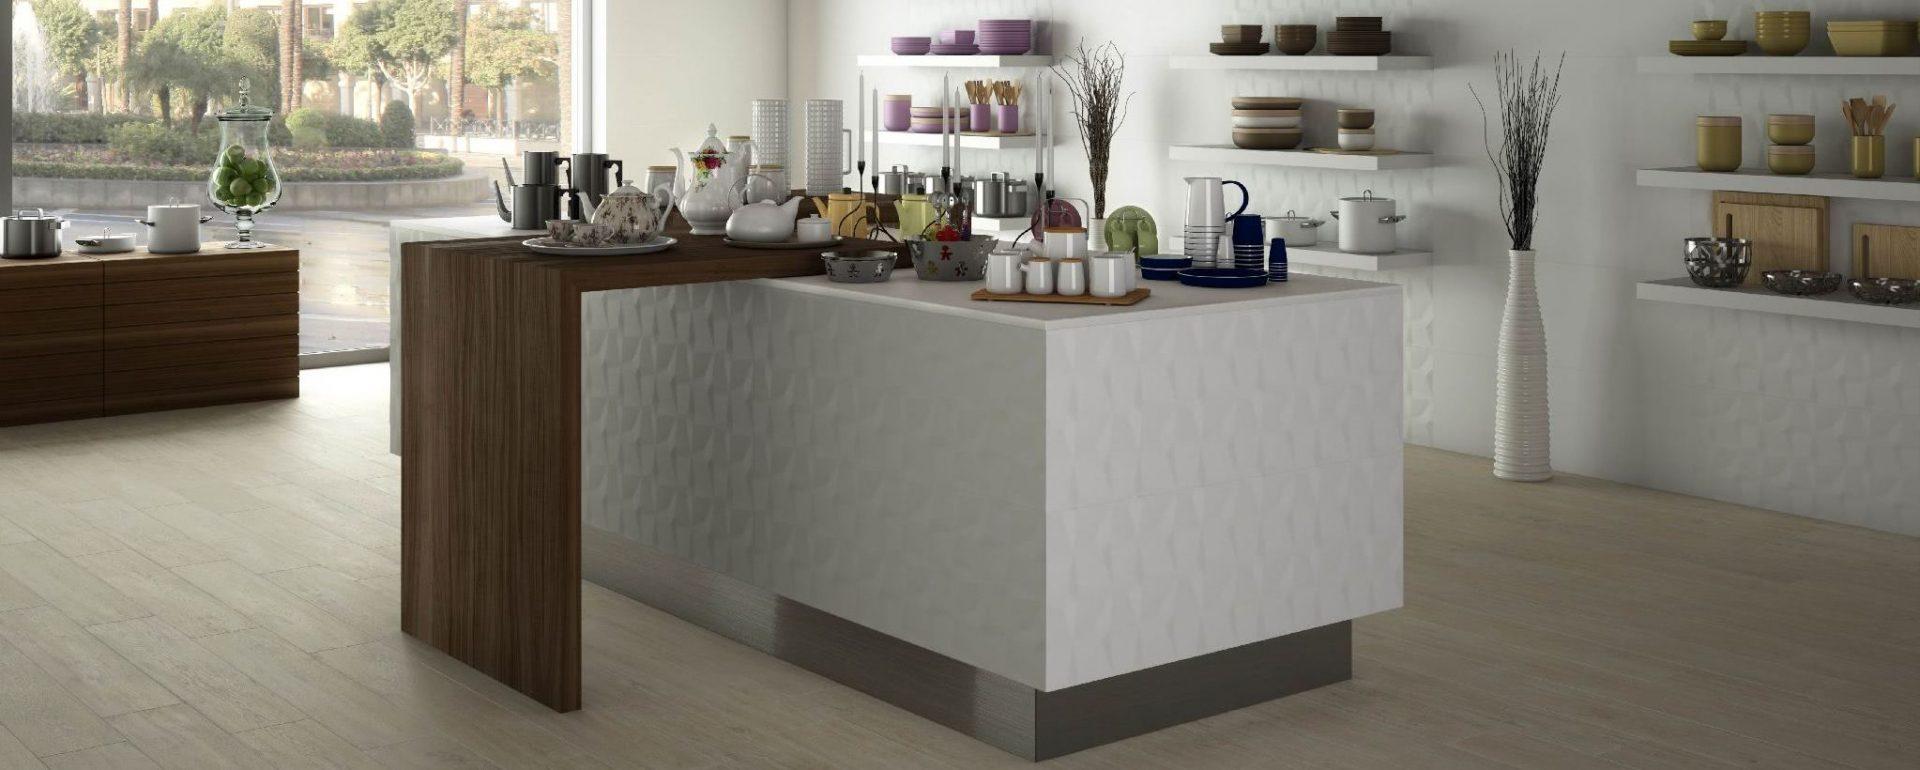 Muebles para el hogar acana interiorismo - Pavimentos para cocinas ...